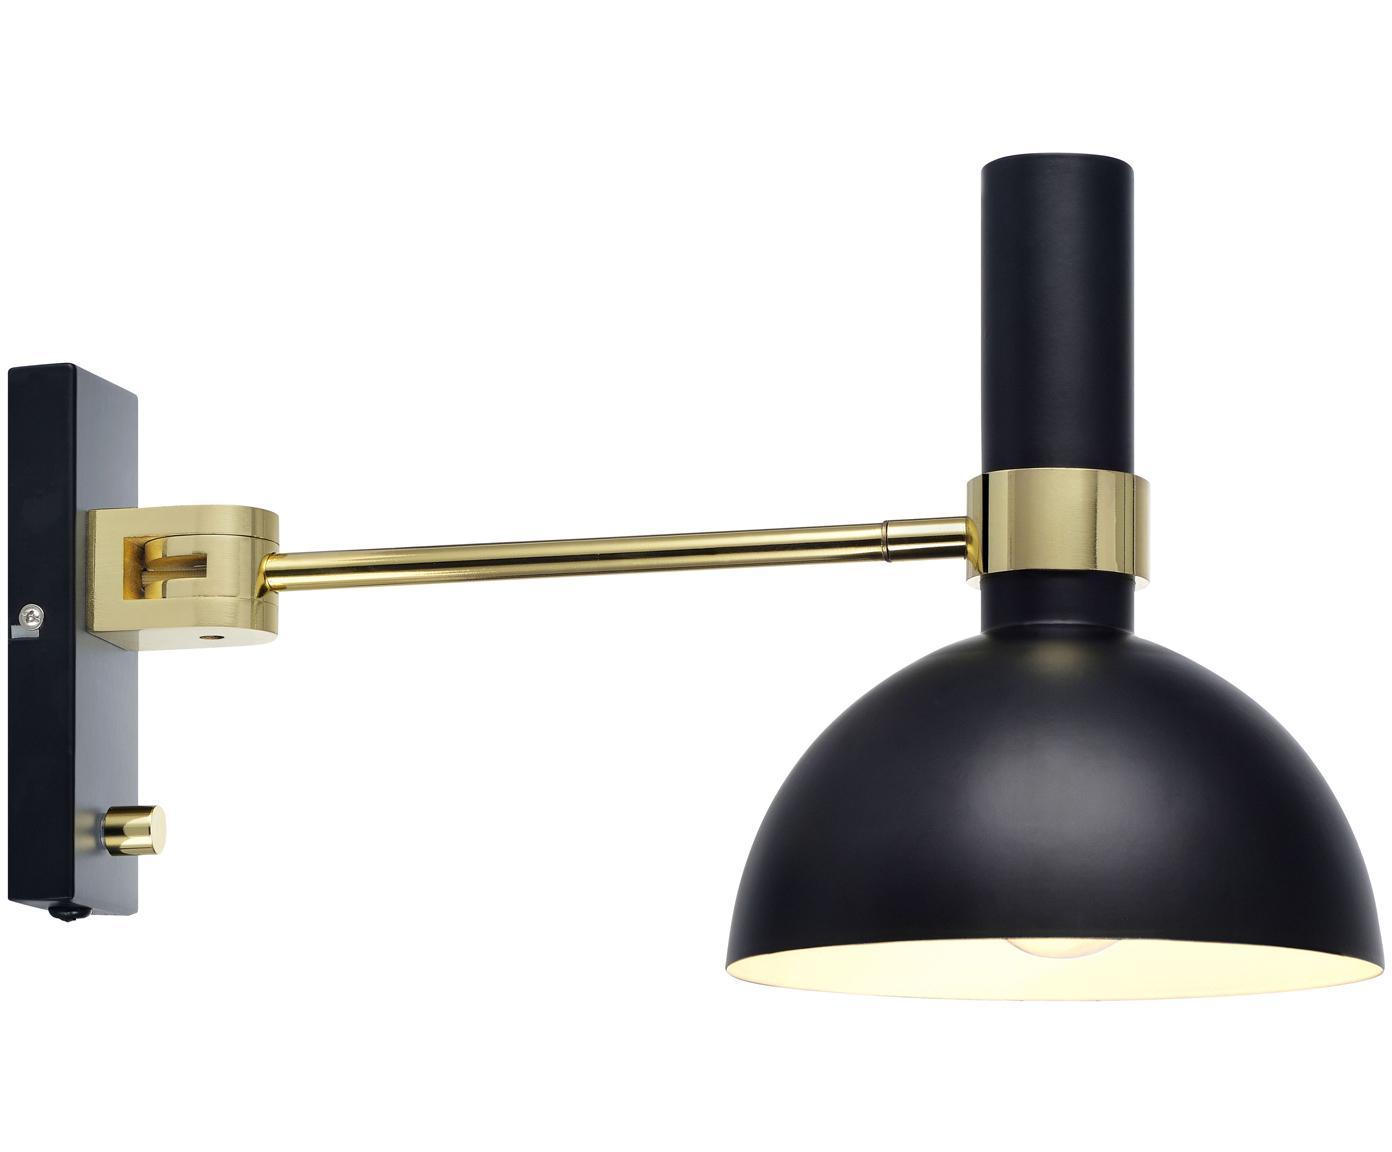 Wandlamp Larry met stekker, Zwart, messingkleurig, 19 x 24 cm